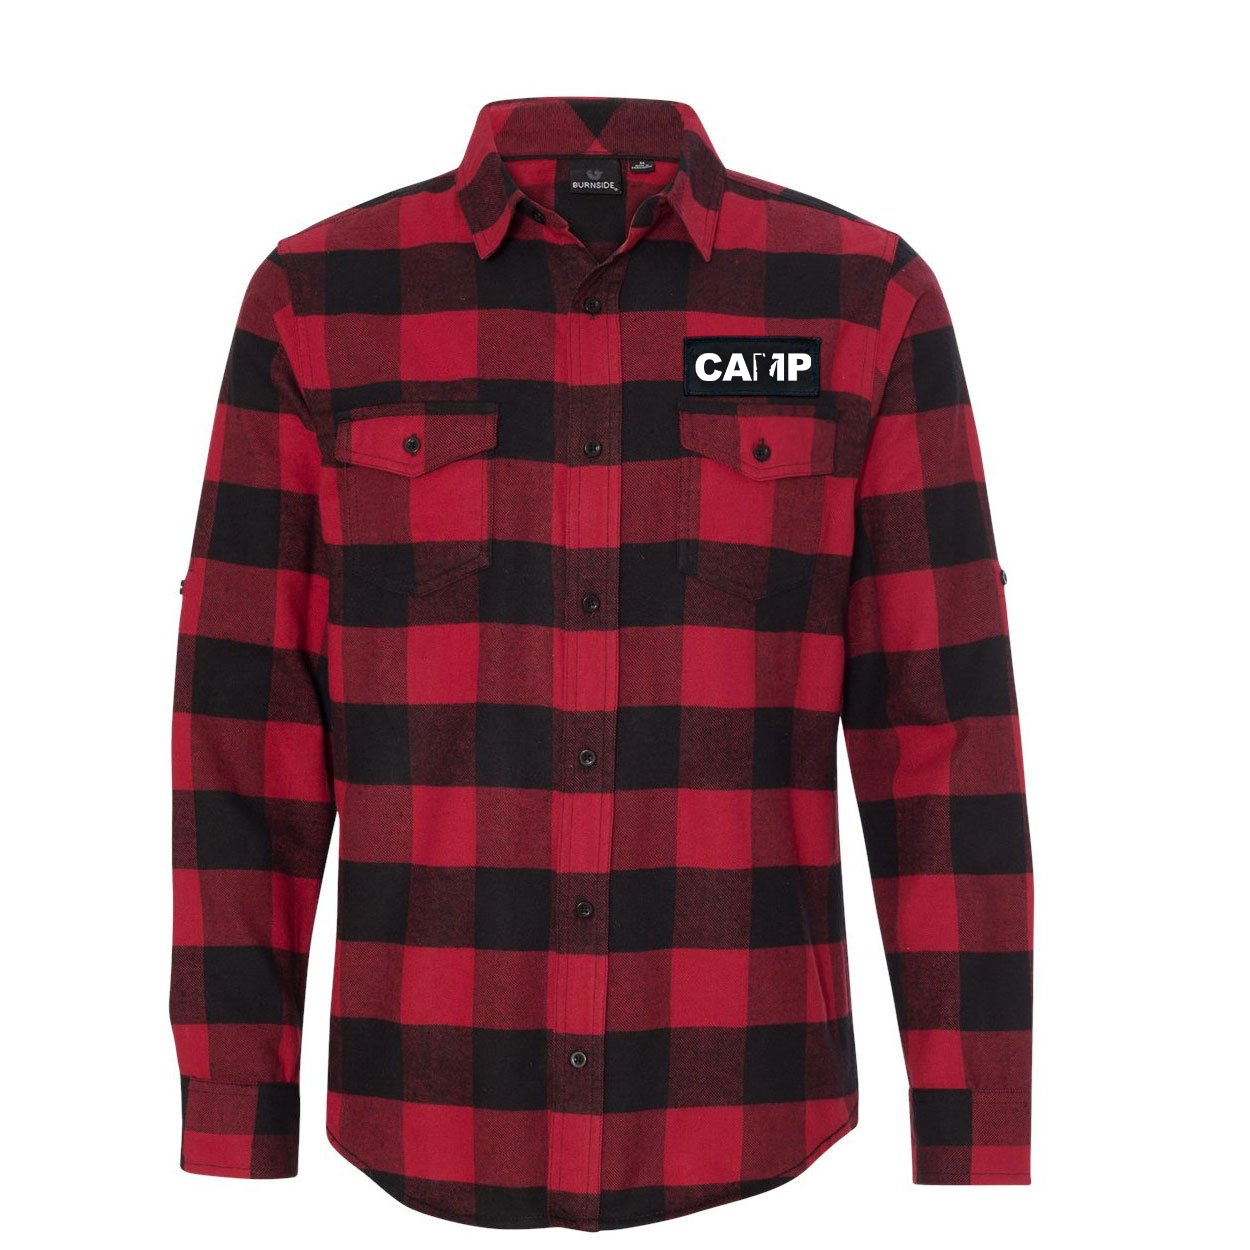 Camp Minnesota Classic Unisex Long Sleeve Woven Patch Flannel Shirt Red/Black Buffalo (White Logo)